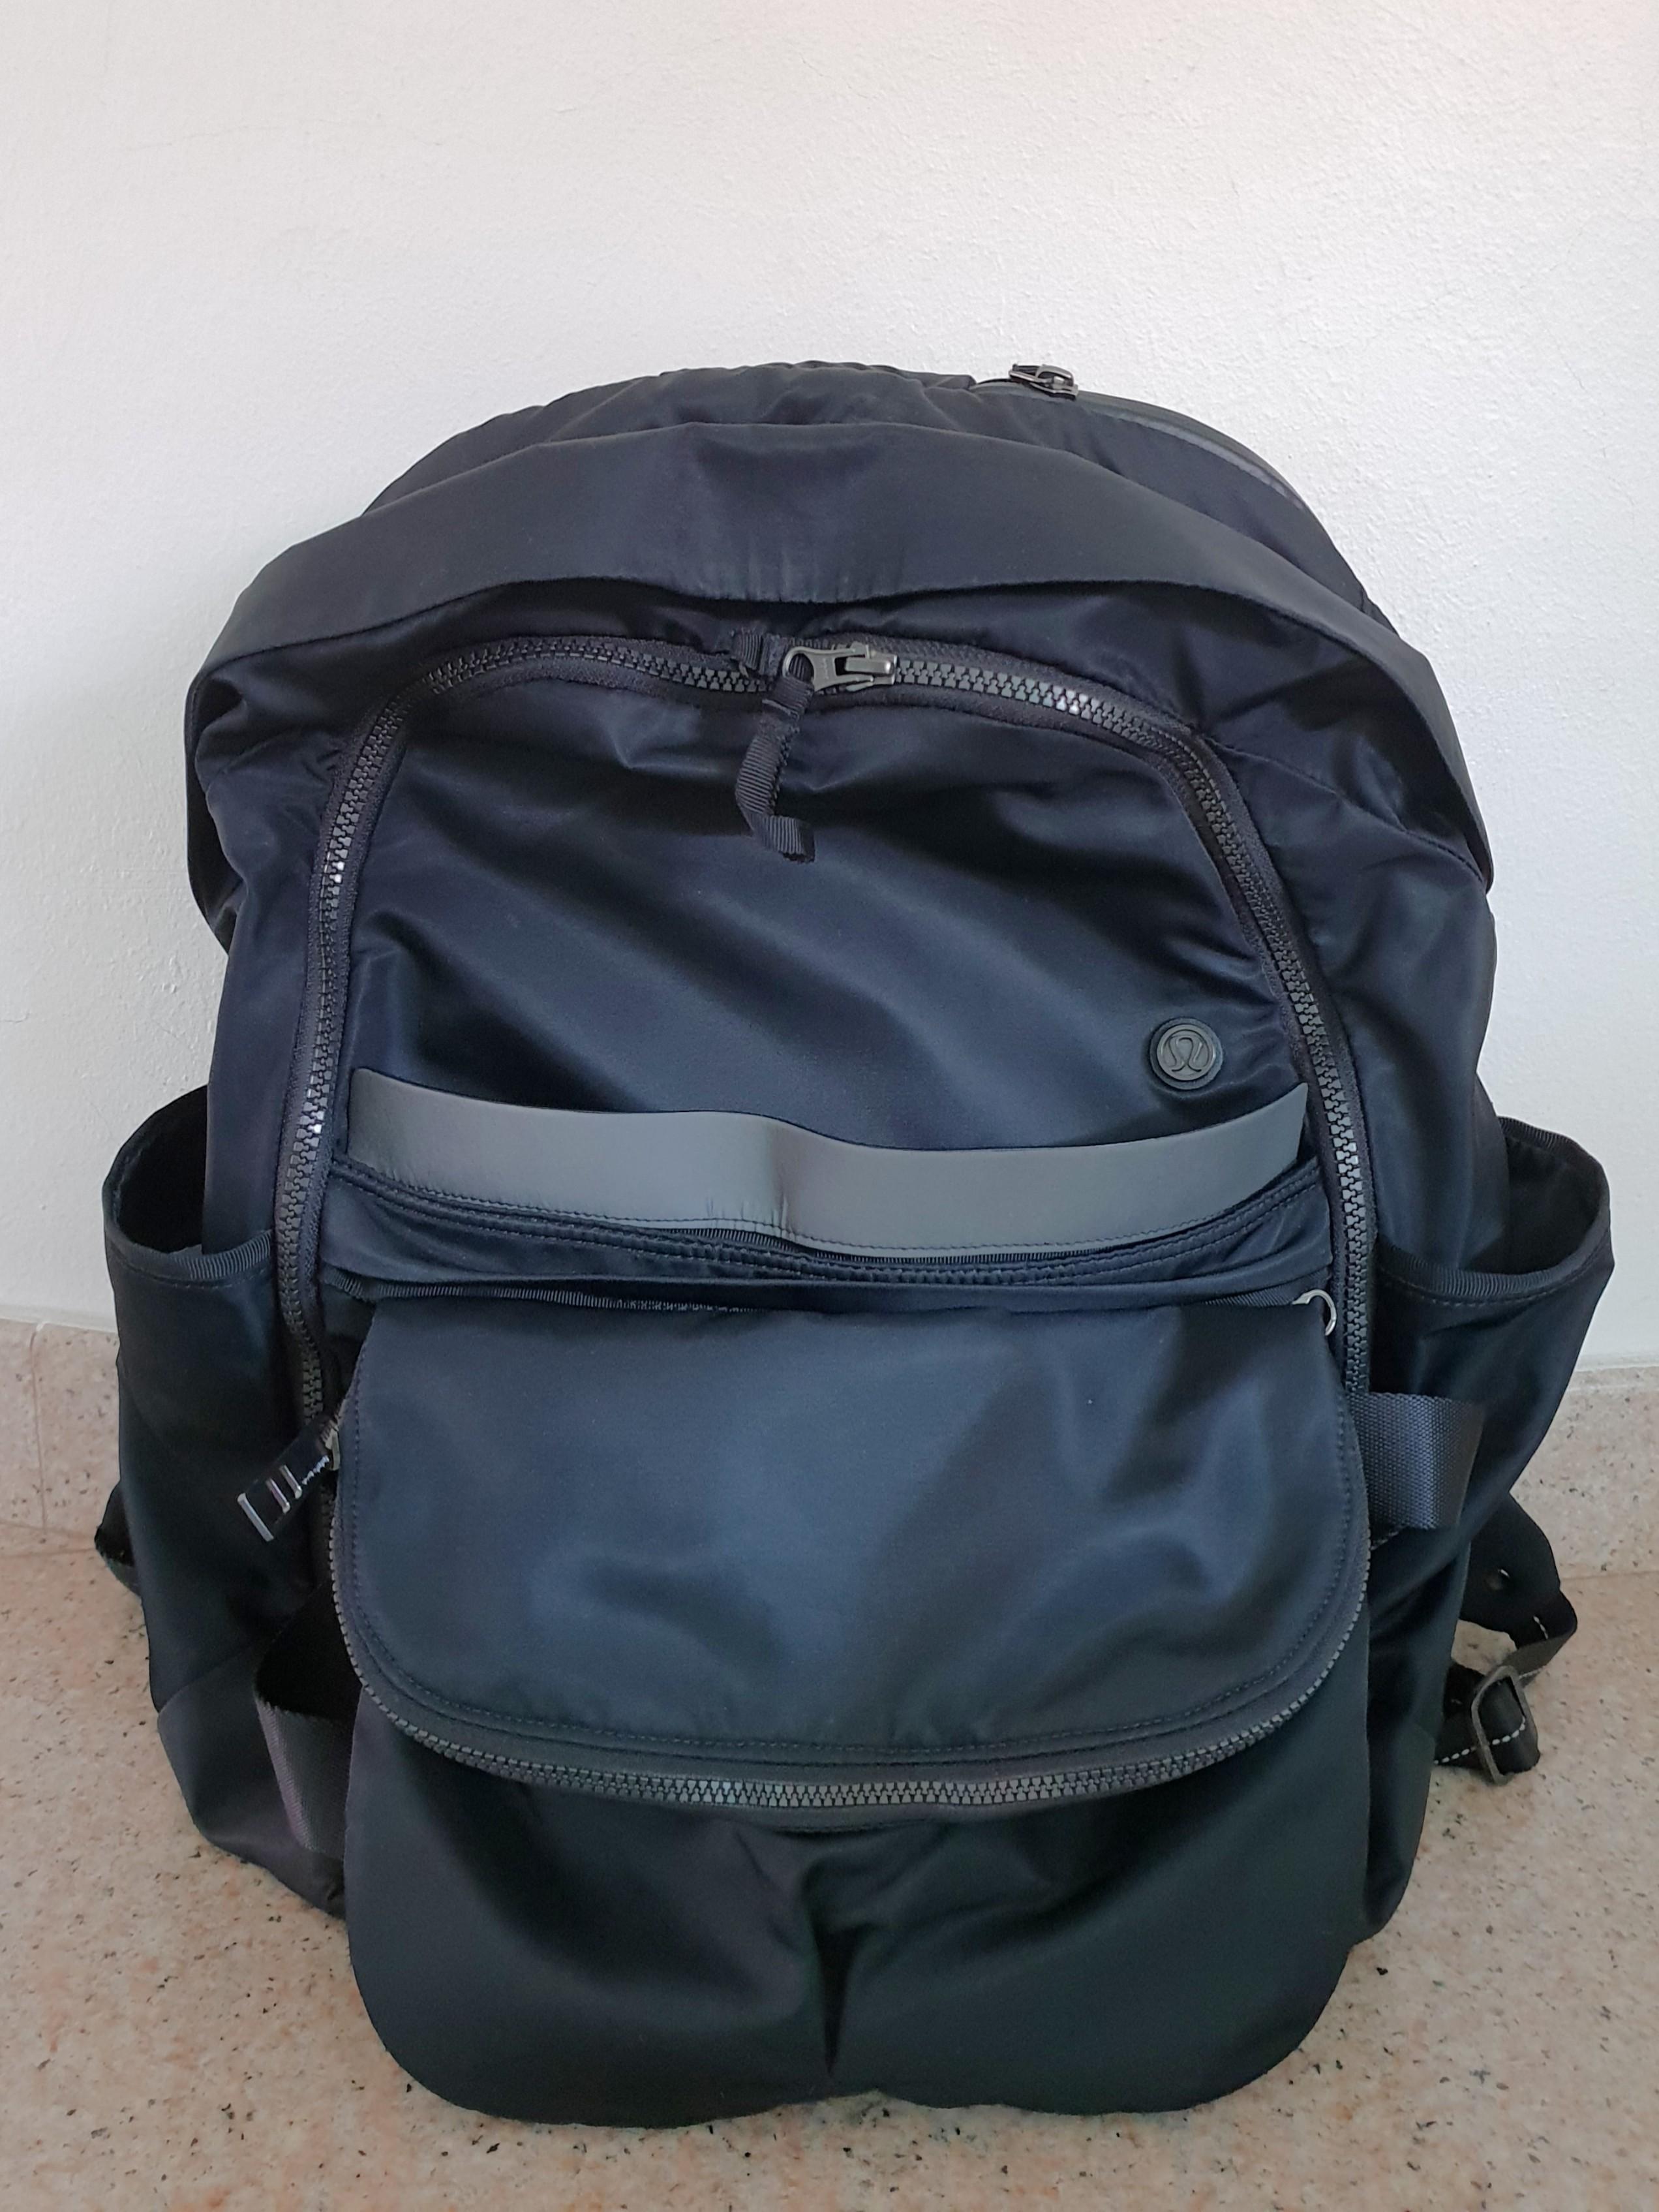 01d24388f10 Lululemon Gym Bags for sale   eBay. Rare Lululemon Messenger Bag Black.